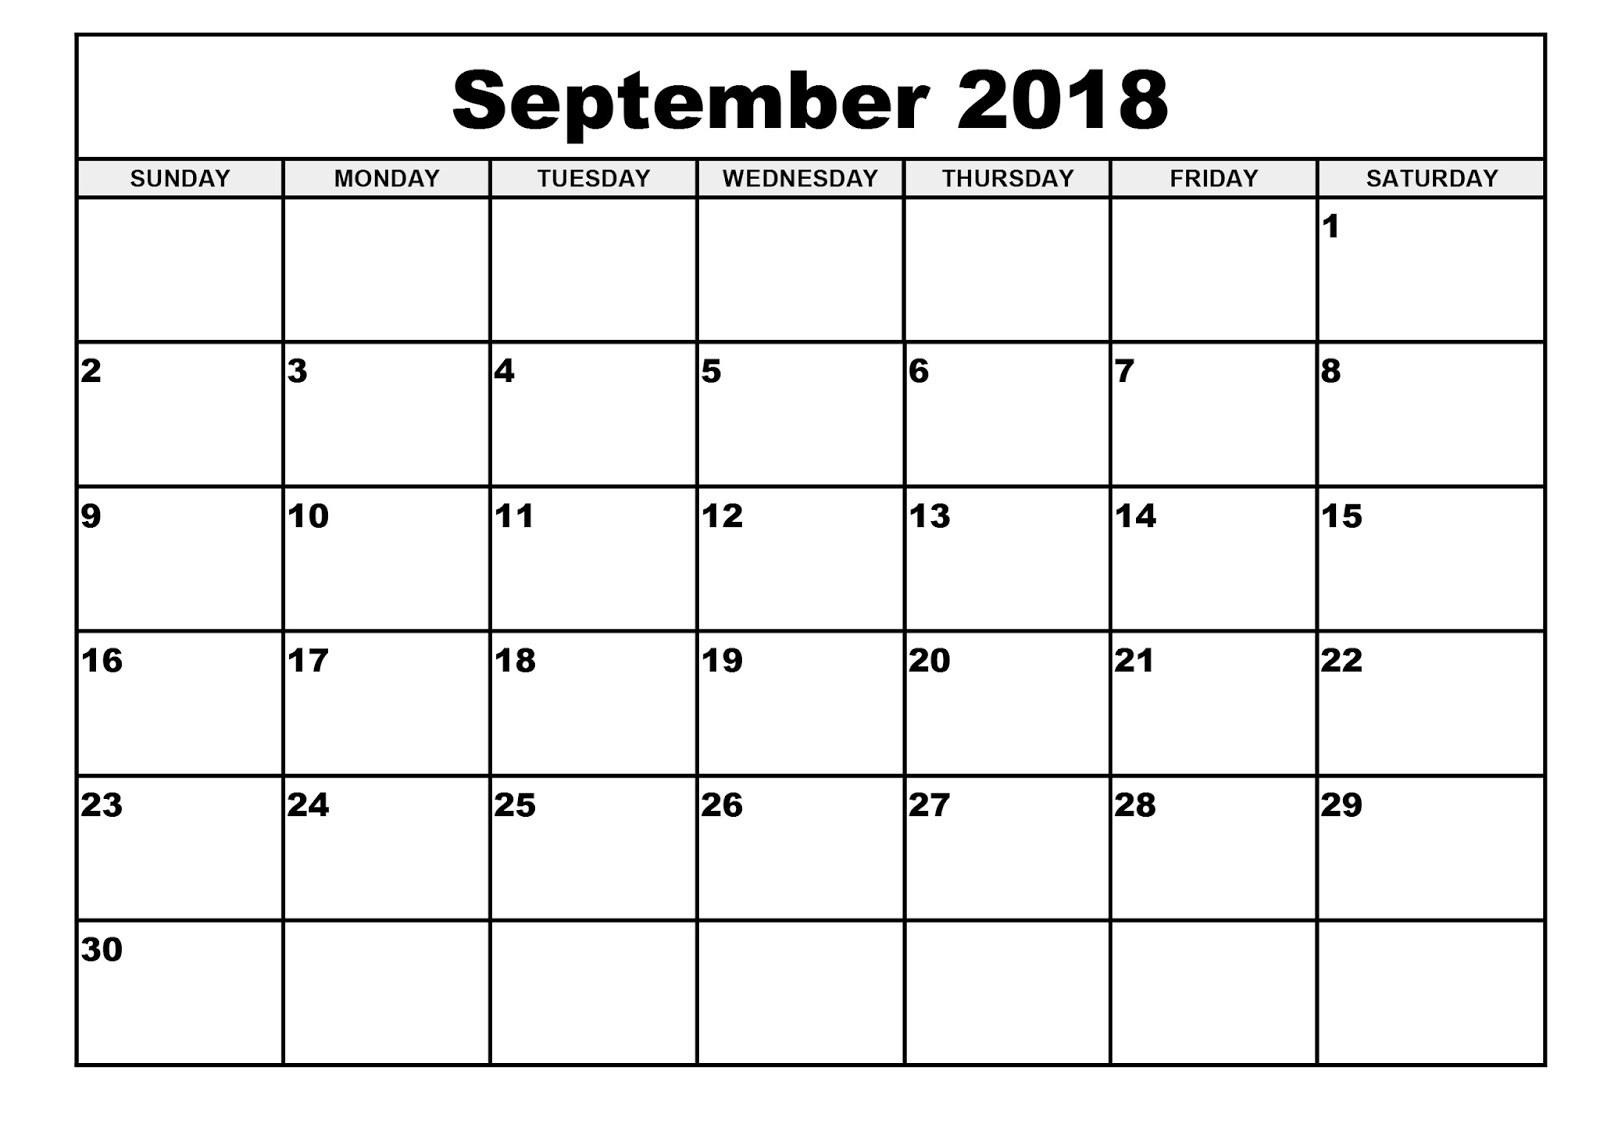 Free September 2018 Calendar In Printable Format Templates regarding November Calendar Templates Editable